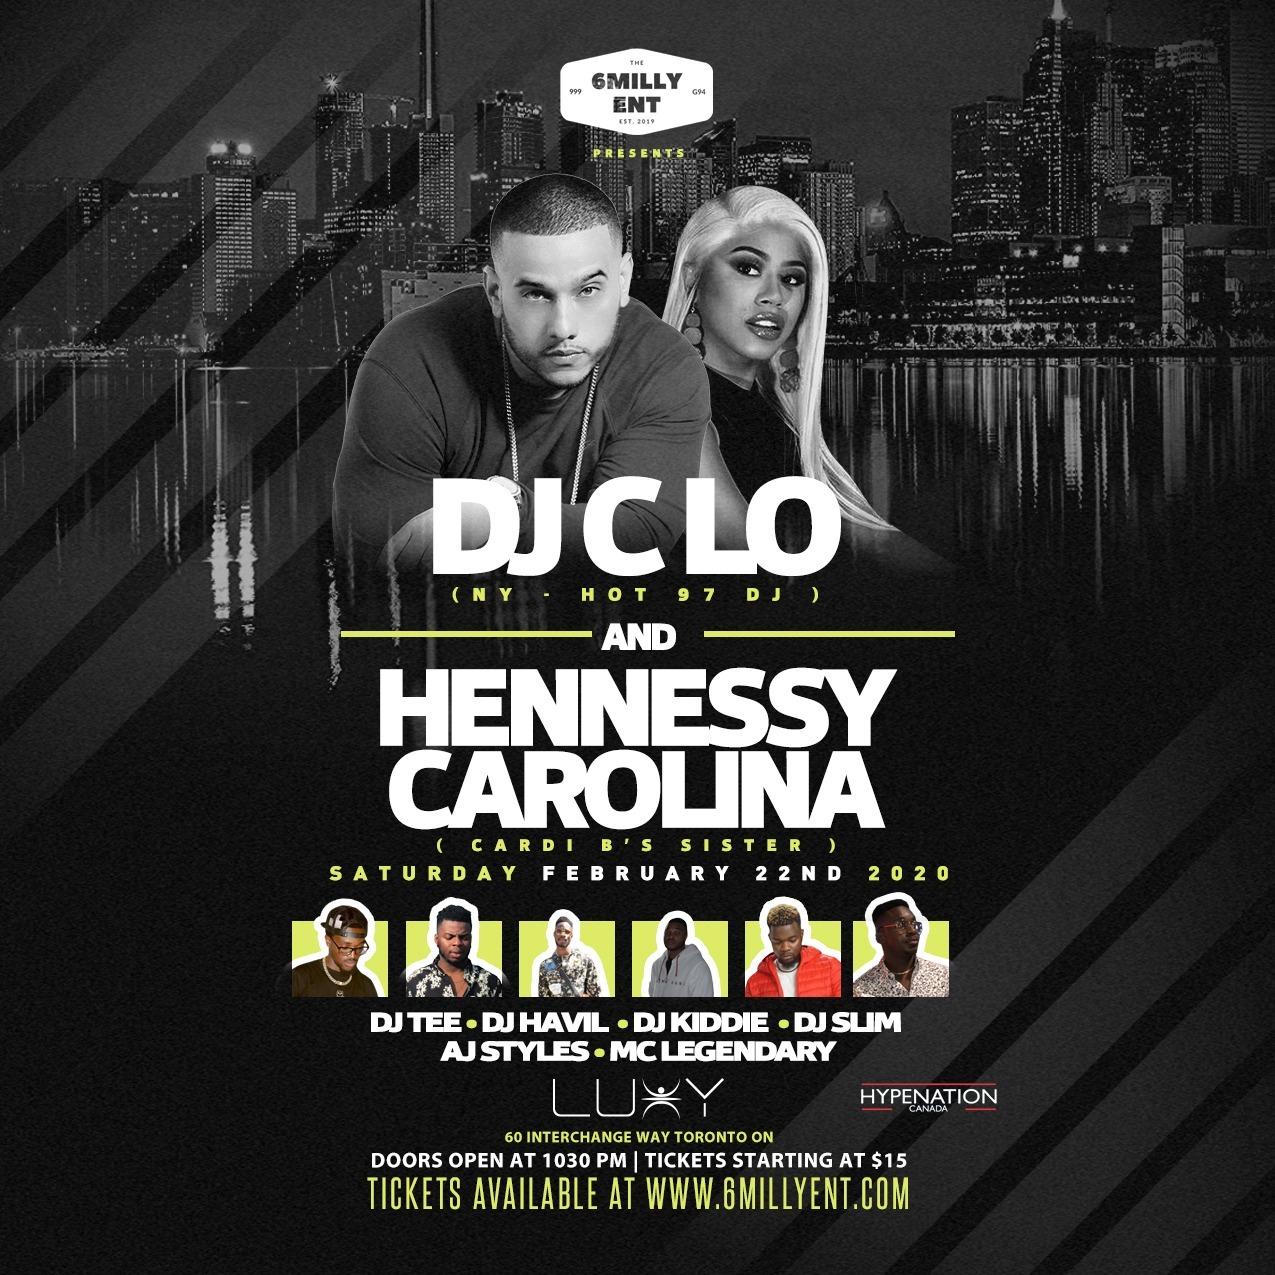 Dj Clo And Hennessy Carolina  @ Luxy Nightclub